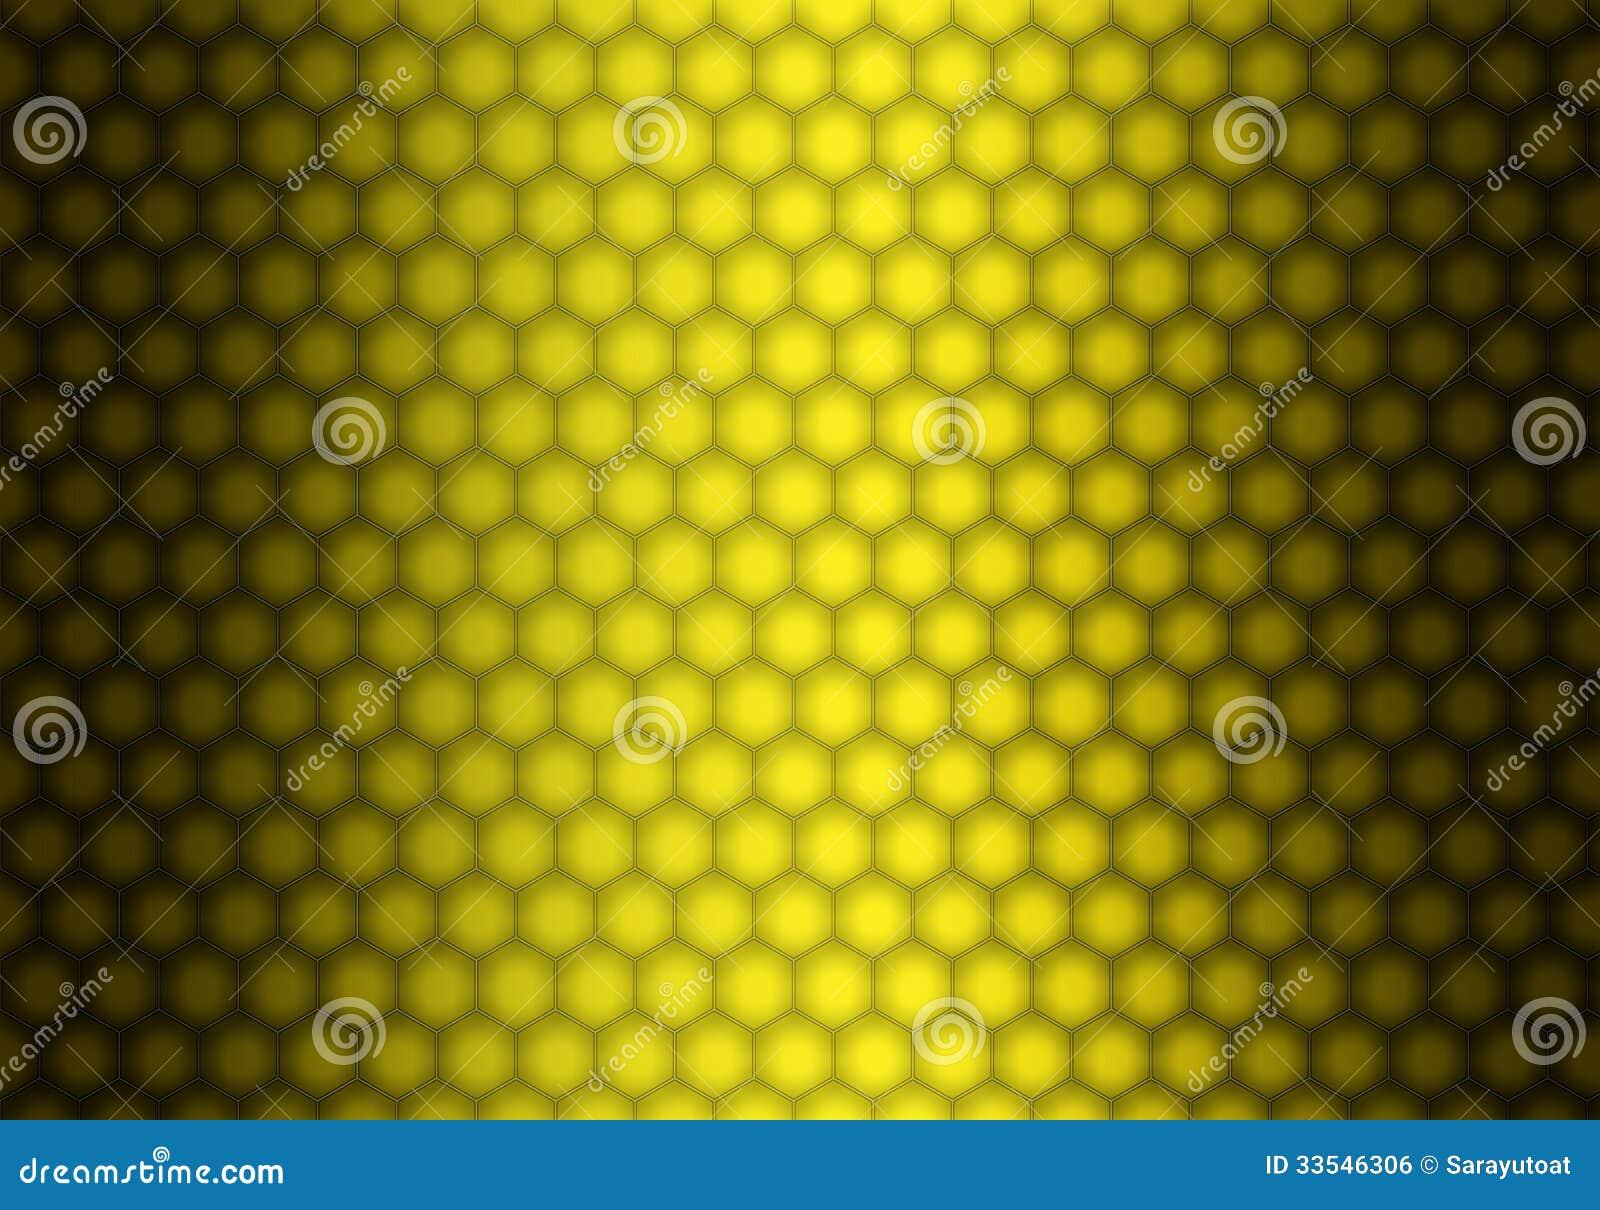 Honeycomb Pattern Royalty Free Stock Image - Image: 33546306